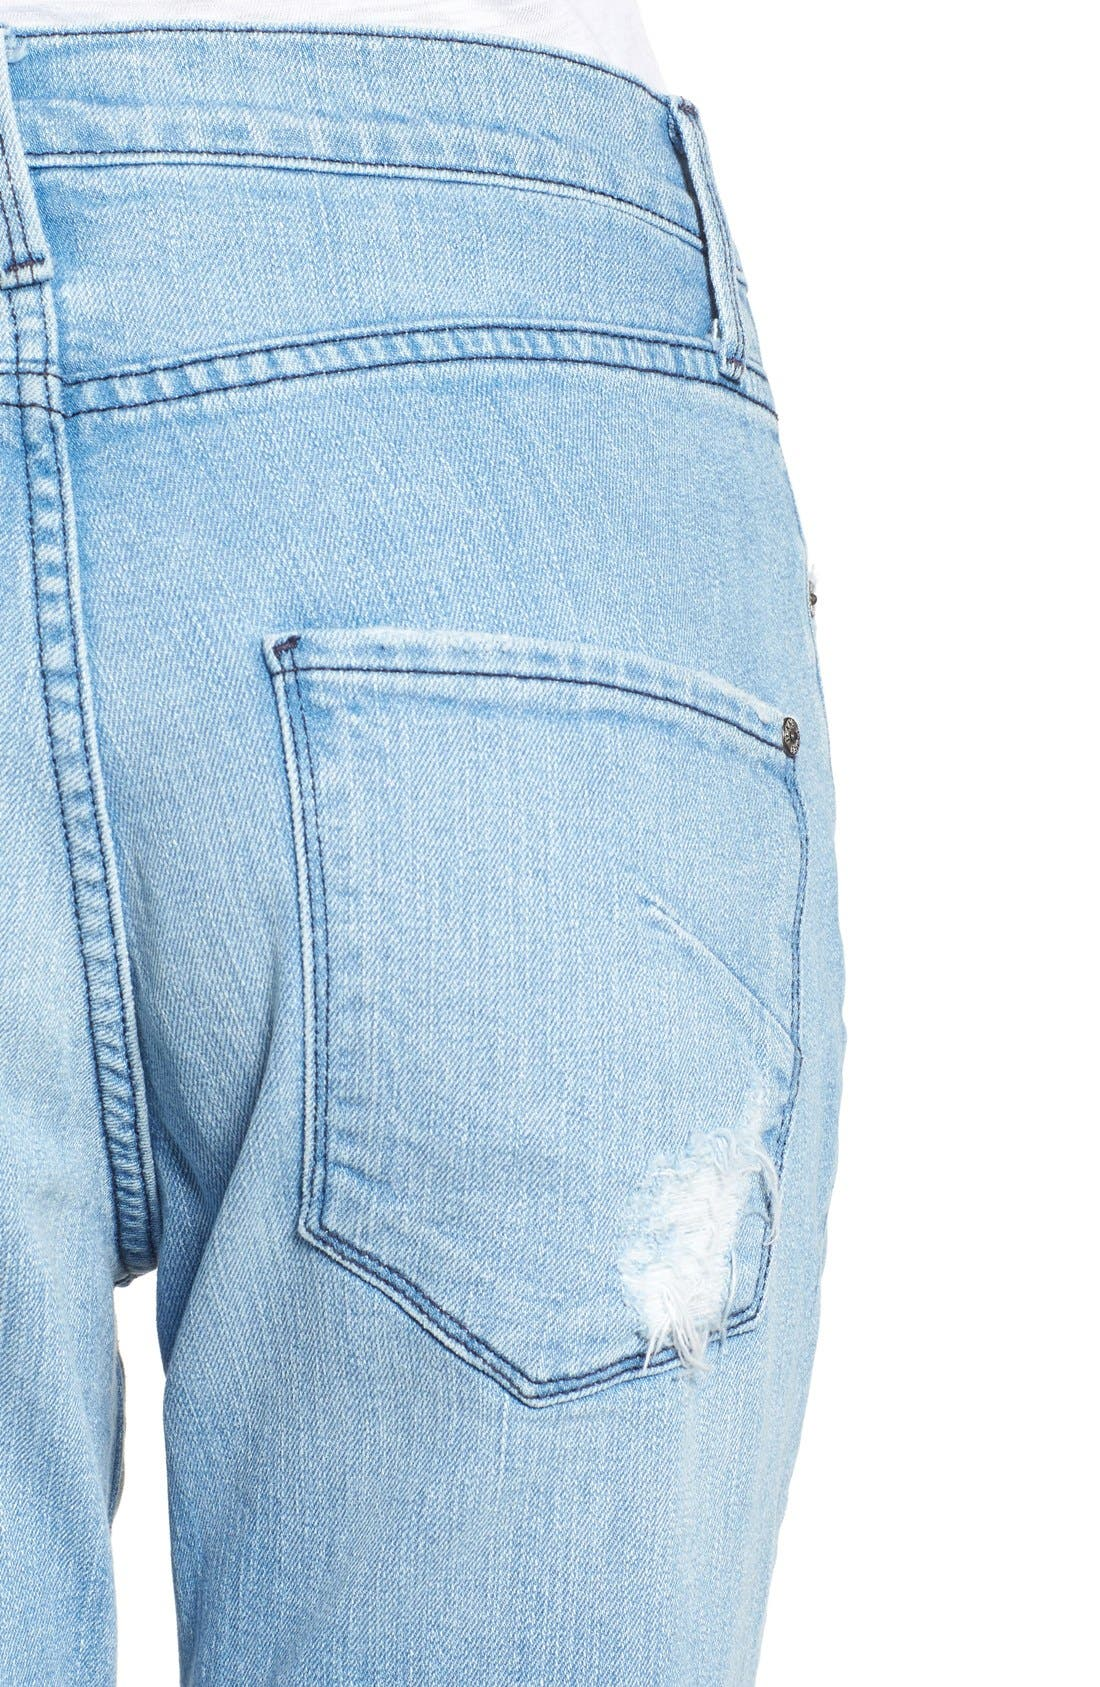 Alternate Image 4  - James Jeans Distressed Bermuda Shorts (Joy Ride)